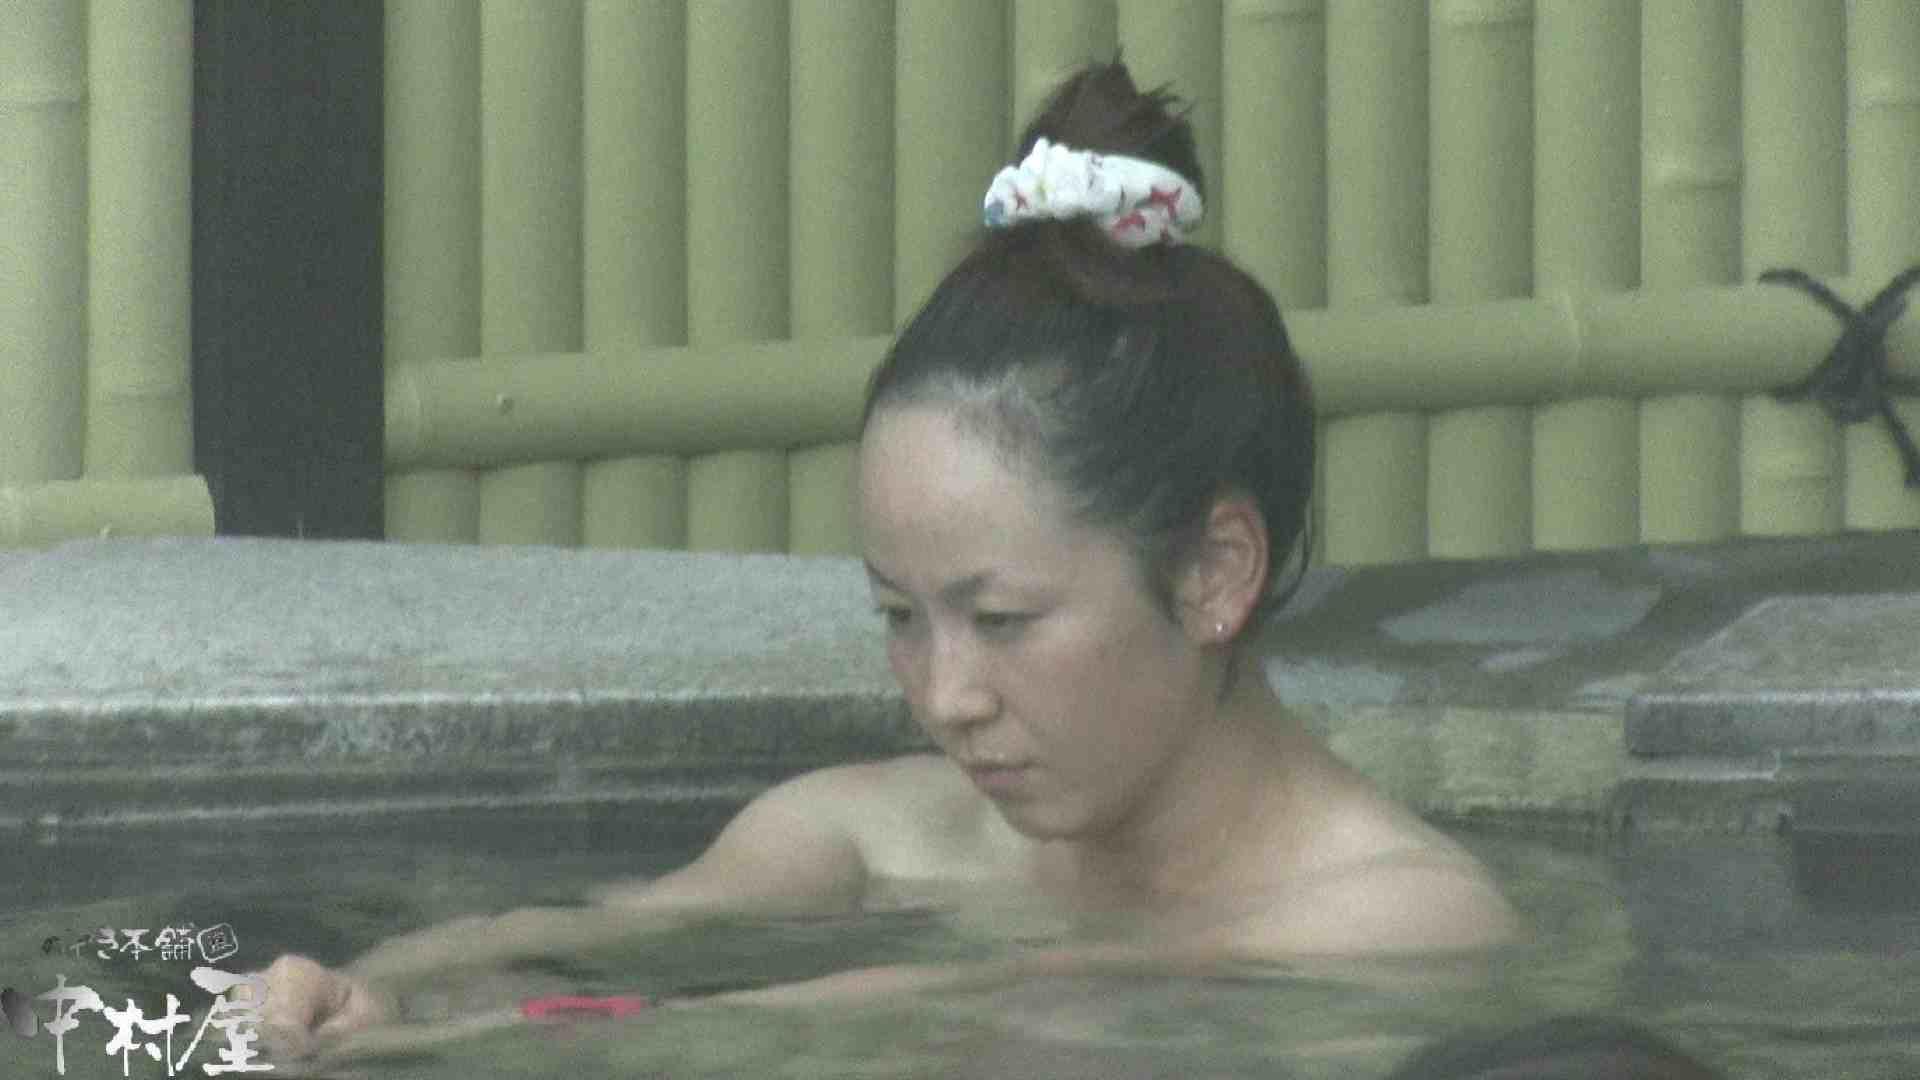 Aquaな露天風呂Vol.911 0   0  88連発 73